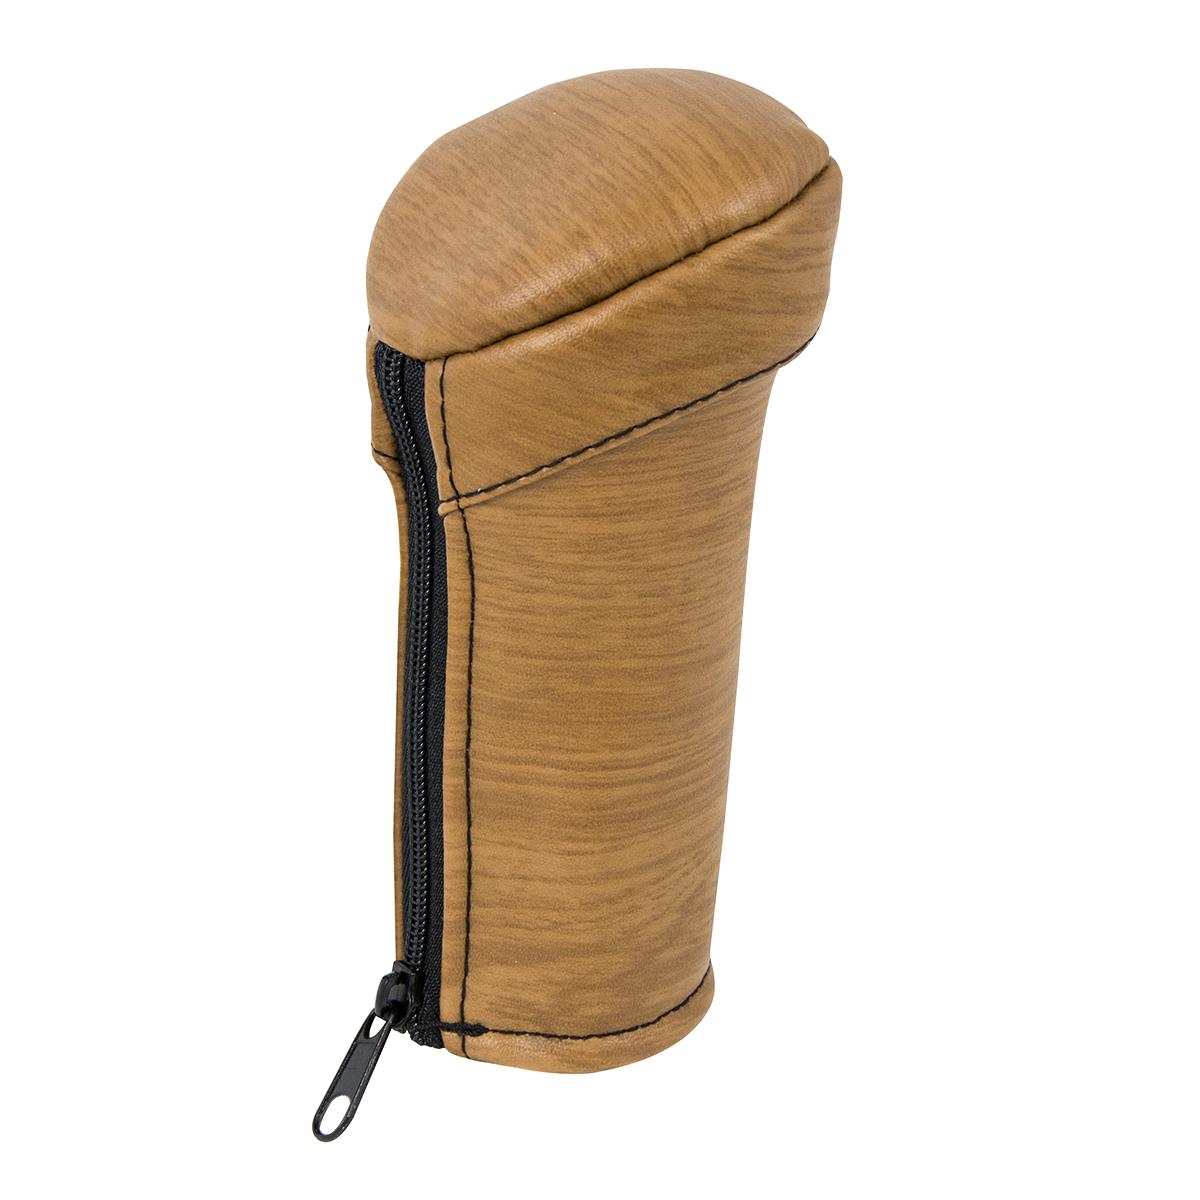 99866 Matte Natural Light Wood Gear Shift Knob Cover